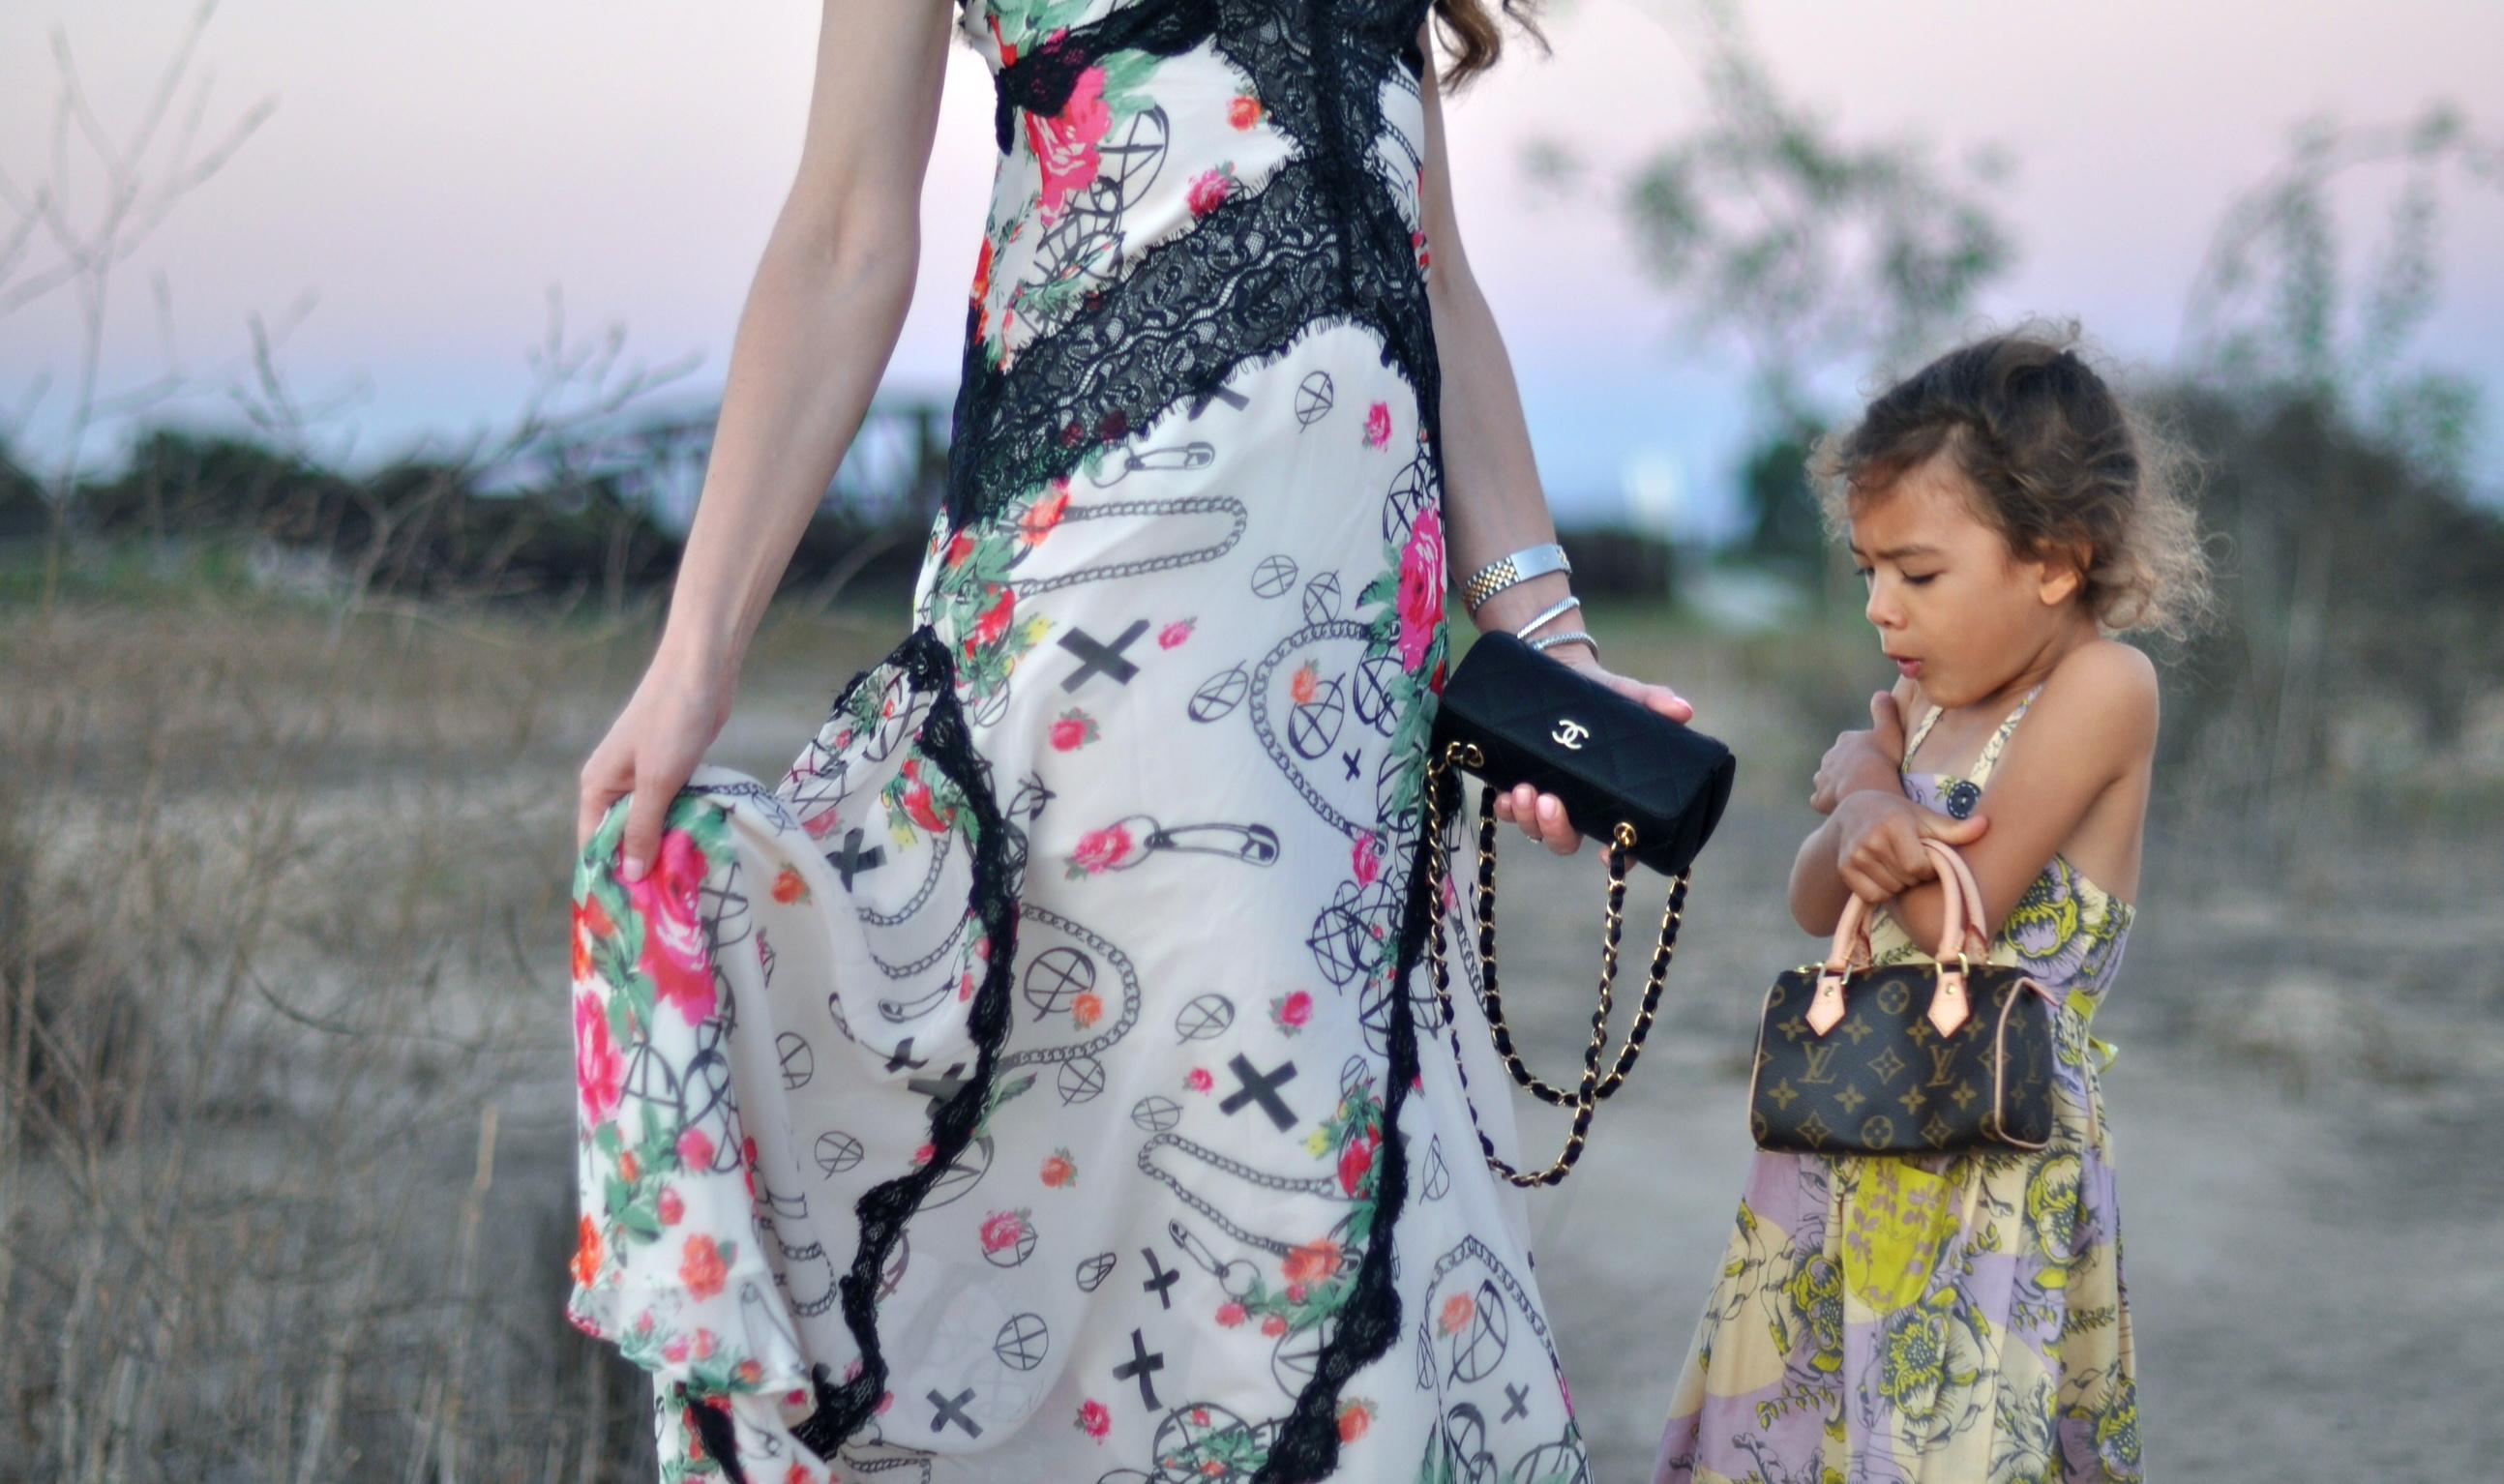 Chanel handbag, Louis Vuitton Handbag, fashion blogger, nasty gal dress, Manolo Blahnik shoes, H & M earrings, Dior Sunglasses, Moxie & Mabel dress, haute hippie sweater